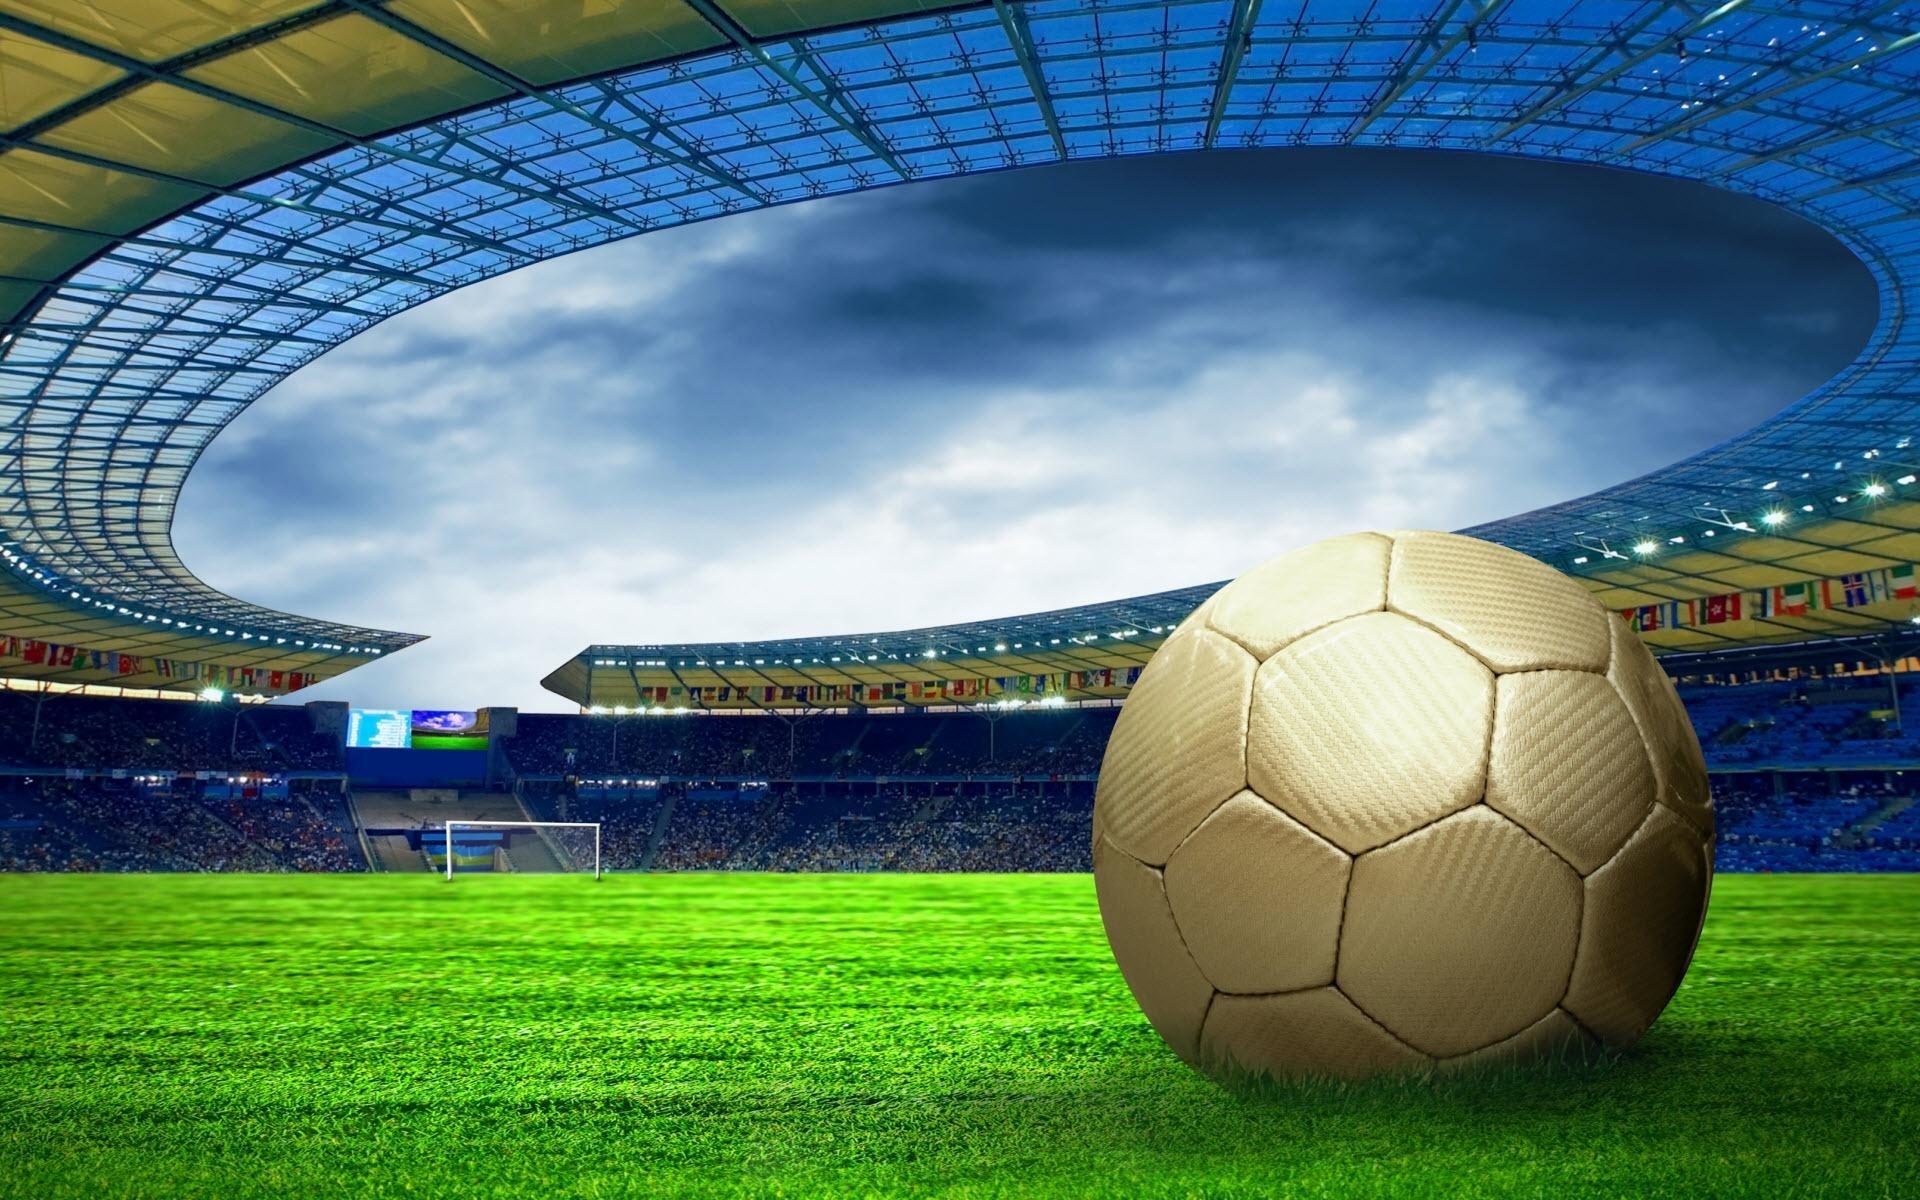 wallpaper.wiki-Football-stadium-1920×1200-wallpaper-PIC-WPC004193